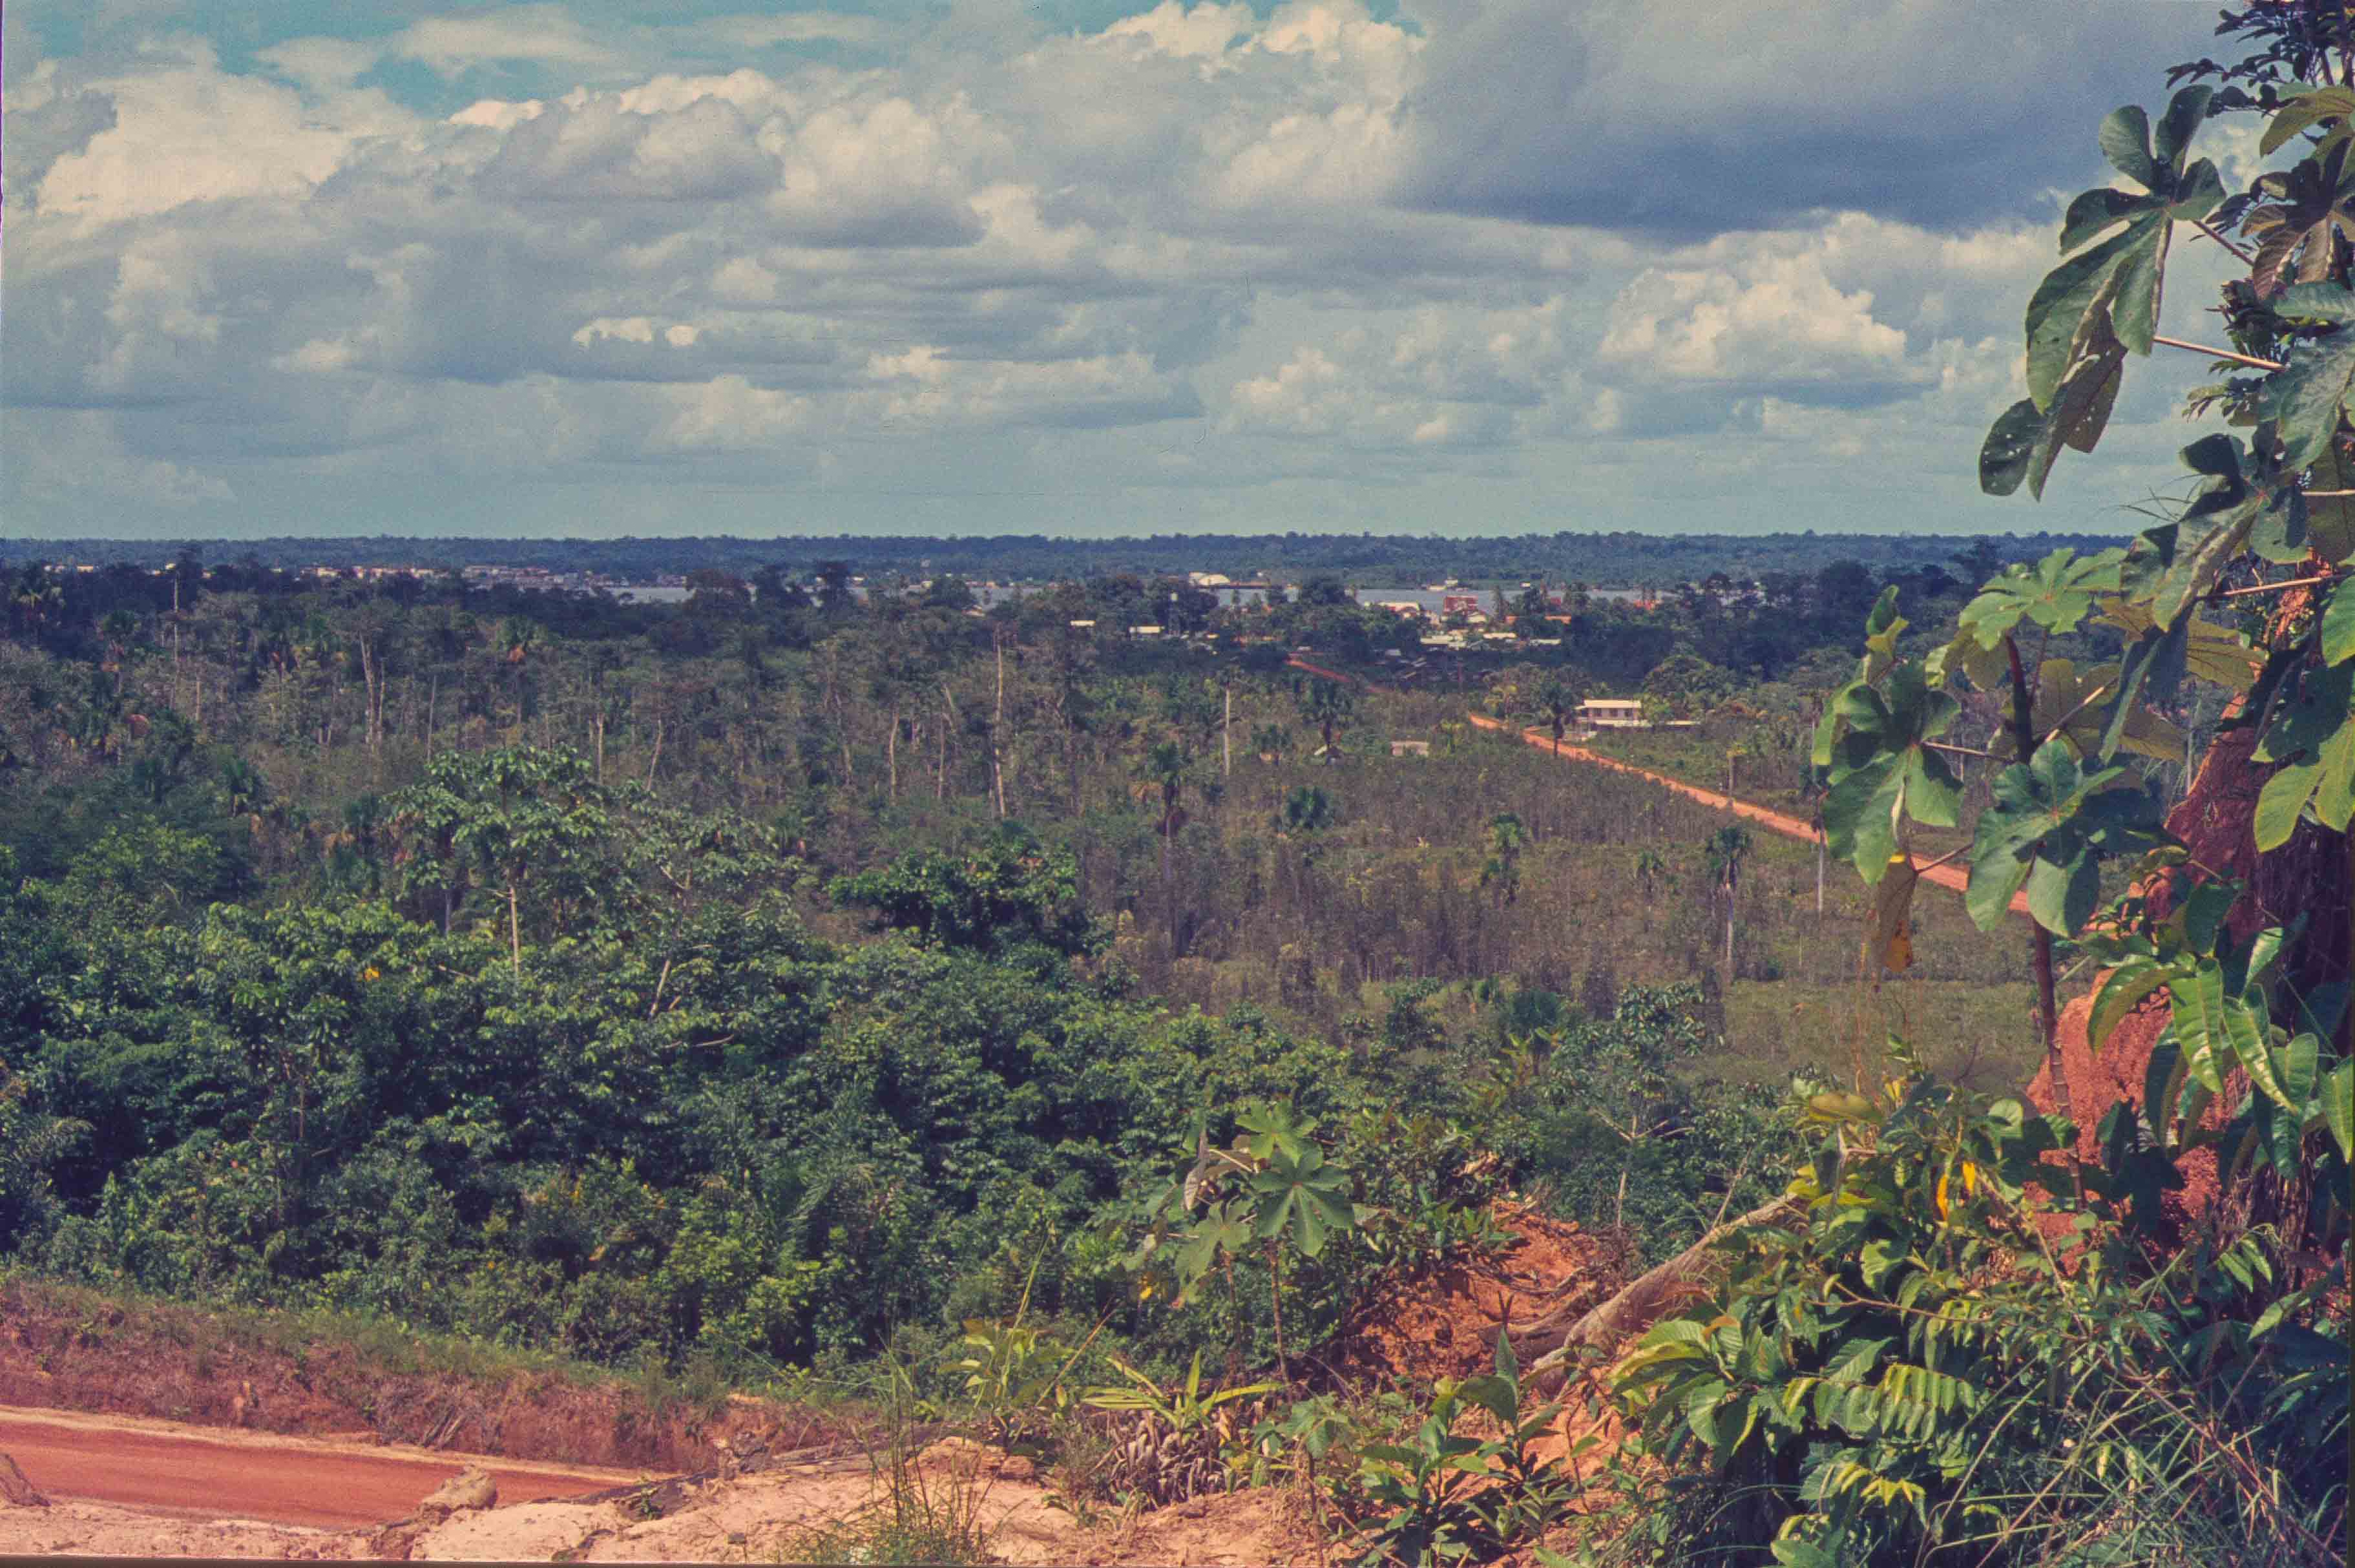 368. Suriname